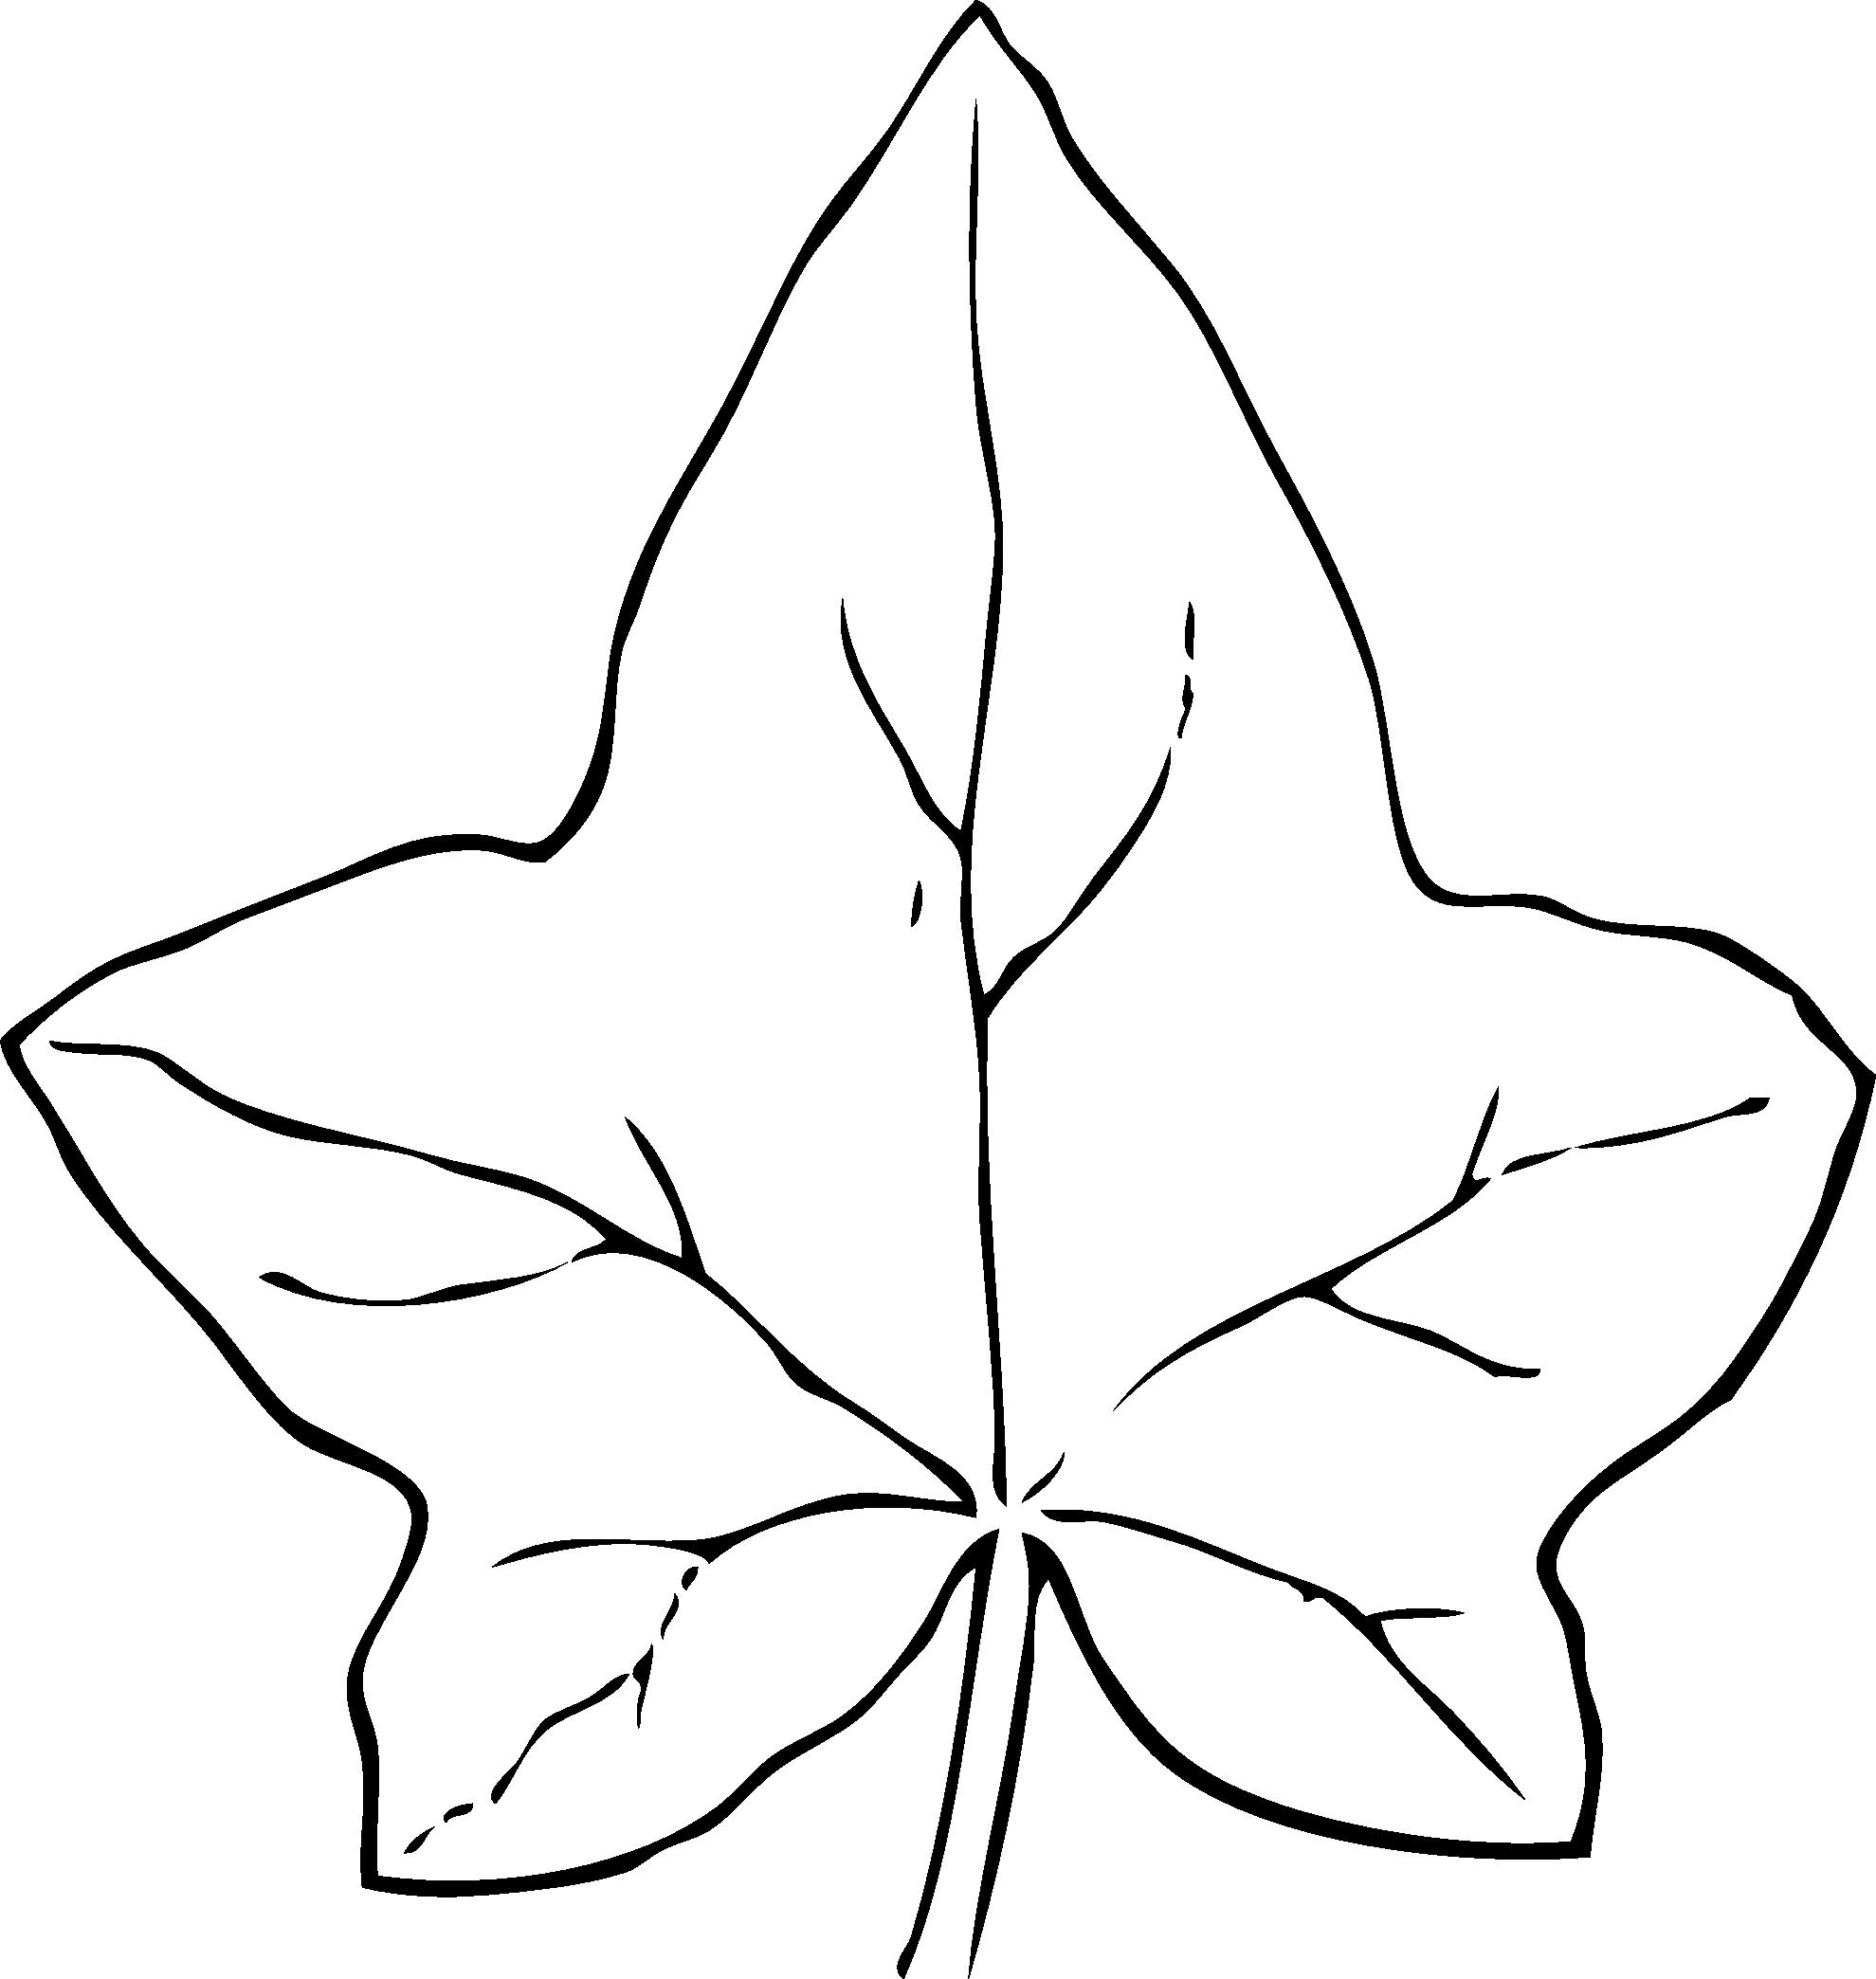 1979x2088 Leaf Border Clipart Black And White